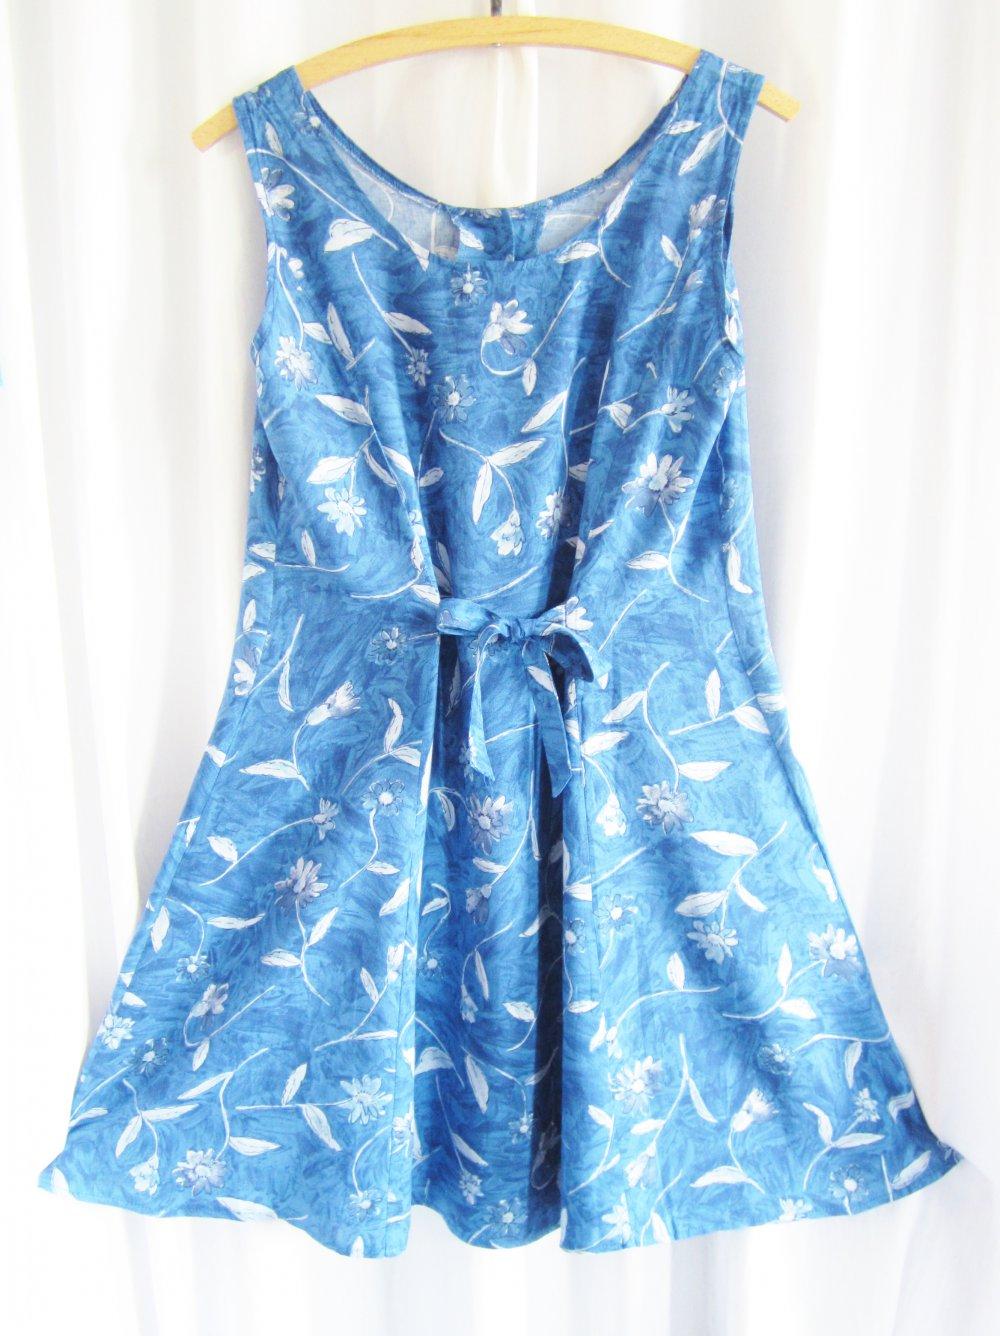 Kleid blau weib geblumt